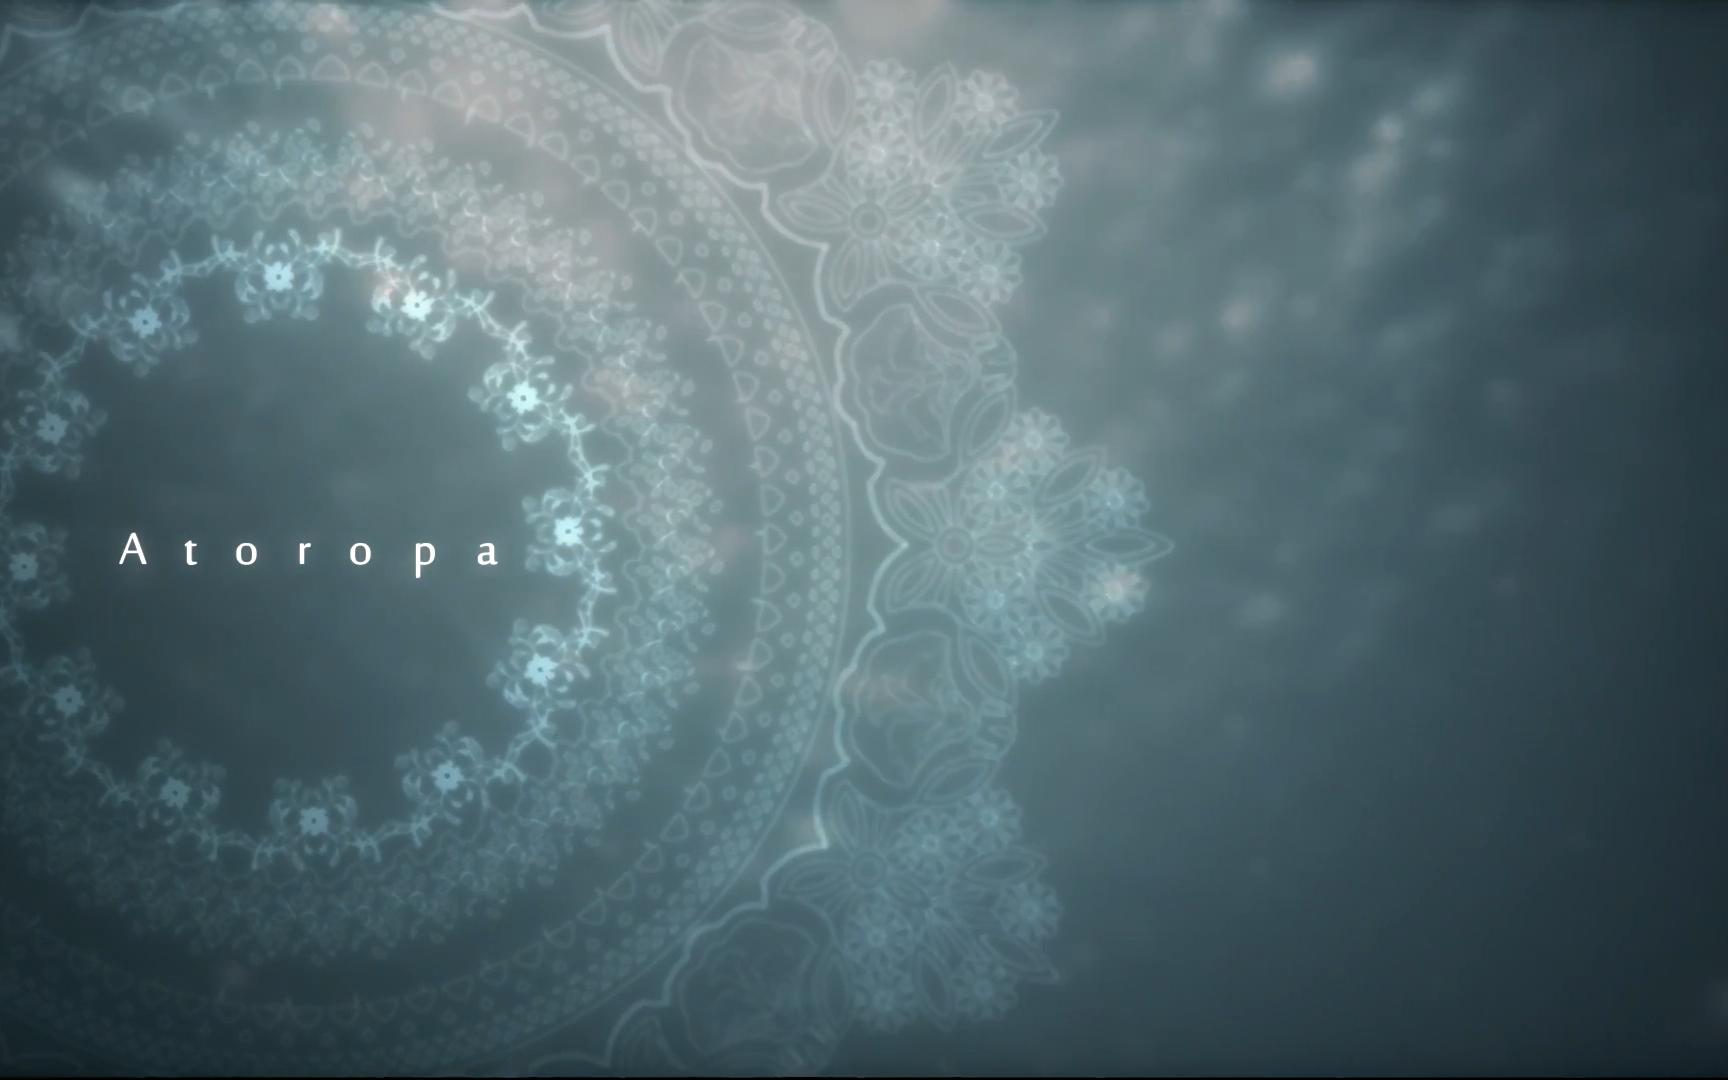 『Atoropa』・霧雨